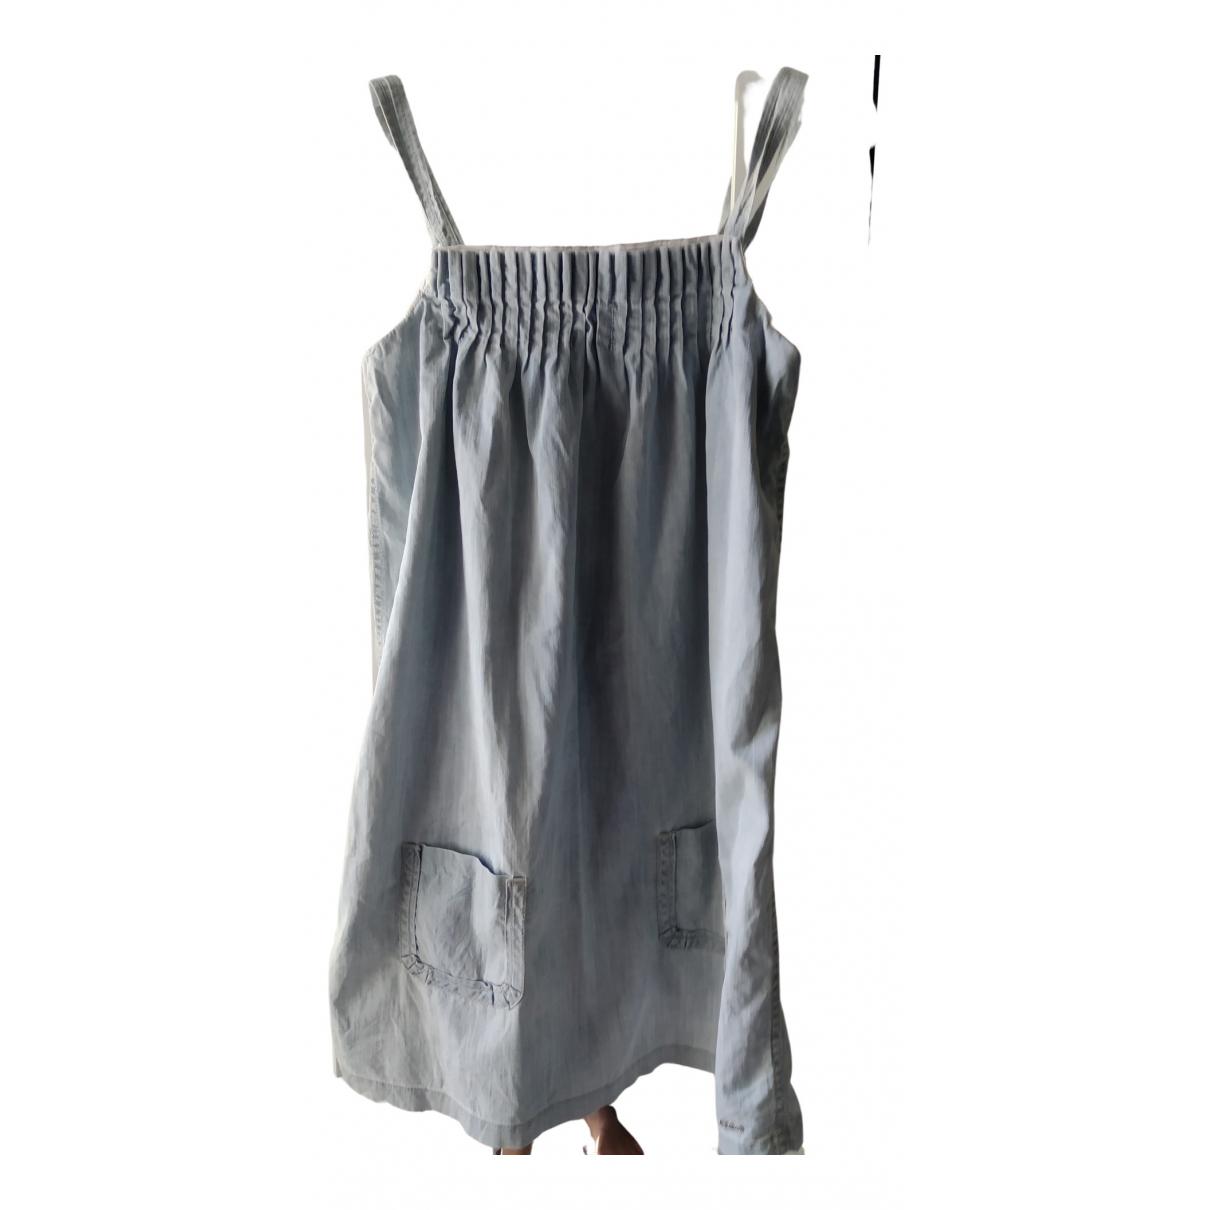 Chloé \N Cotton dress for Kids 12 years - XS FR